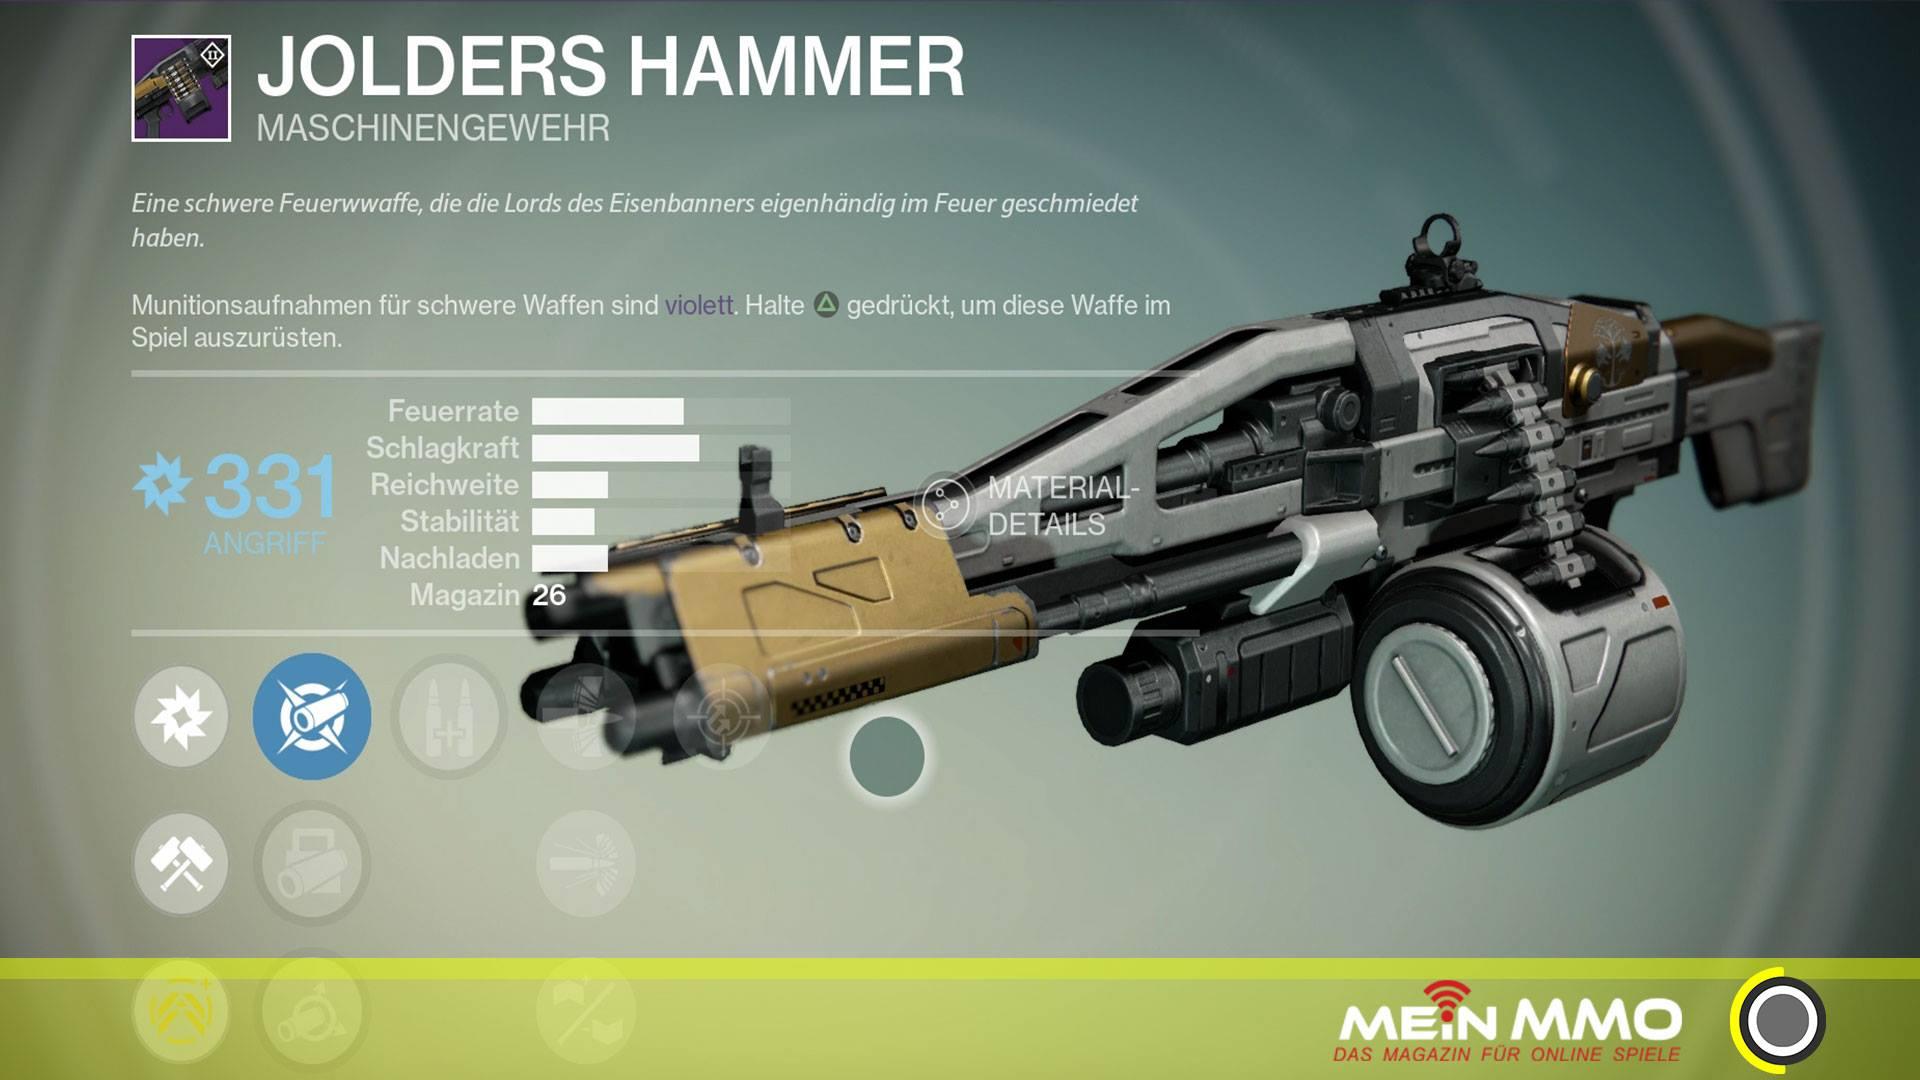 Jolders-Hammer-Destiny-017